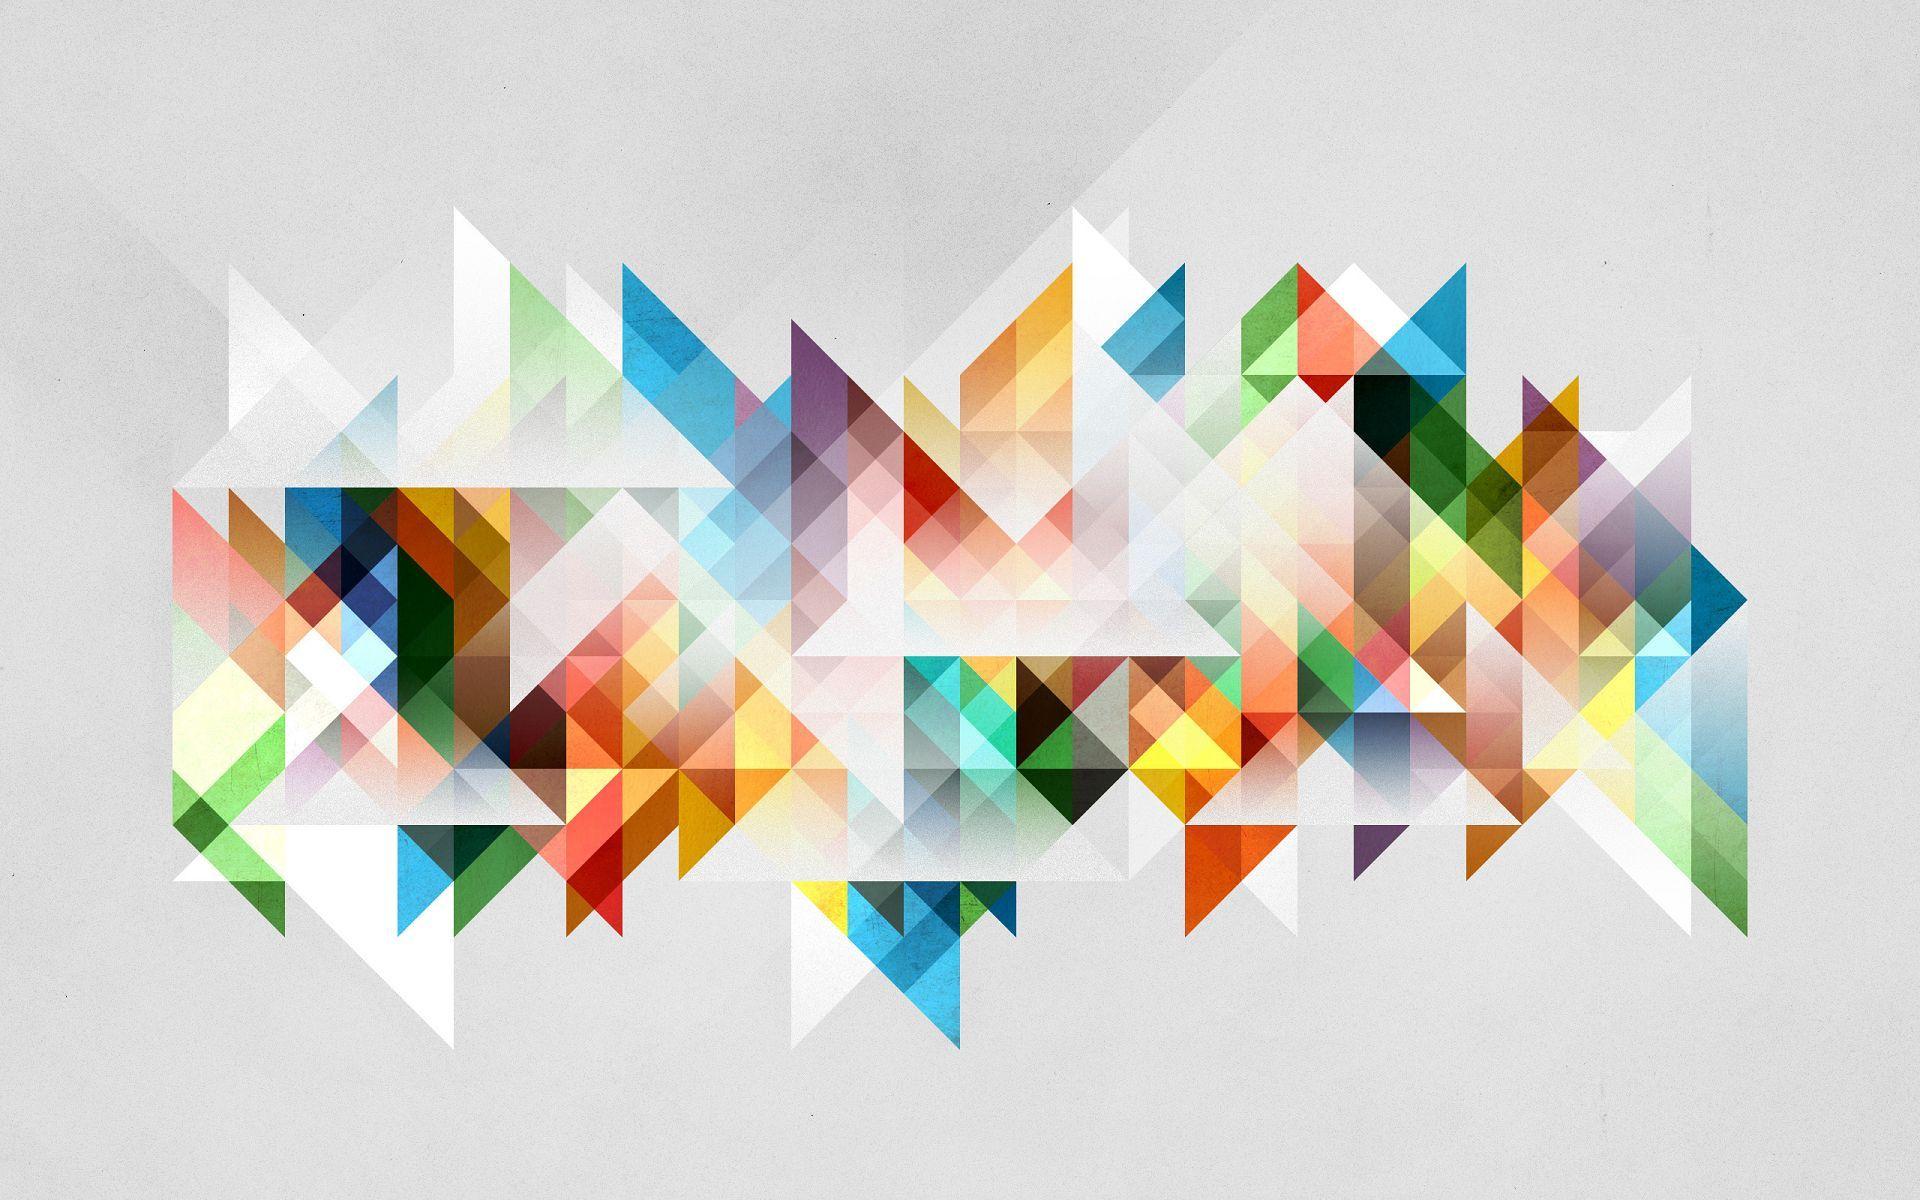 Sfondi Geometrici Per Os X The Apple Lounge